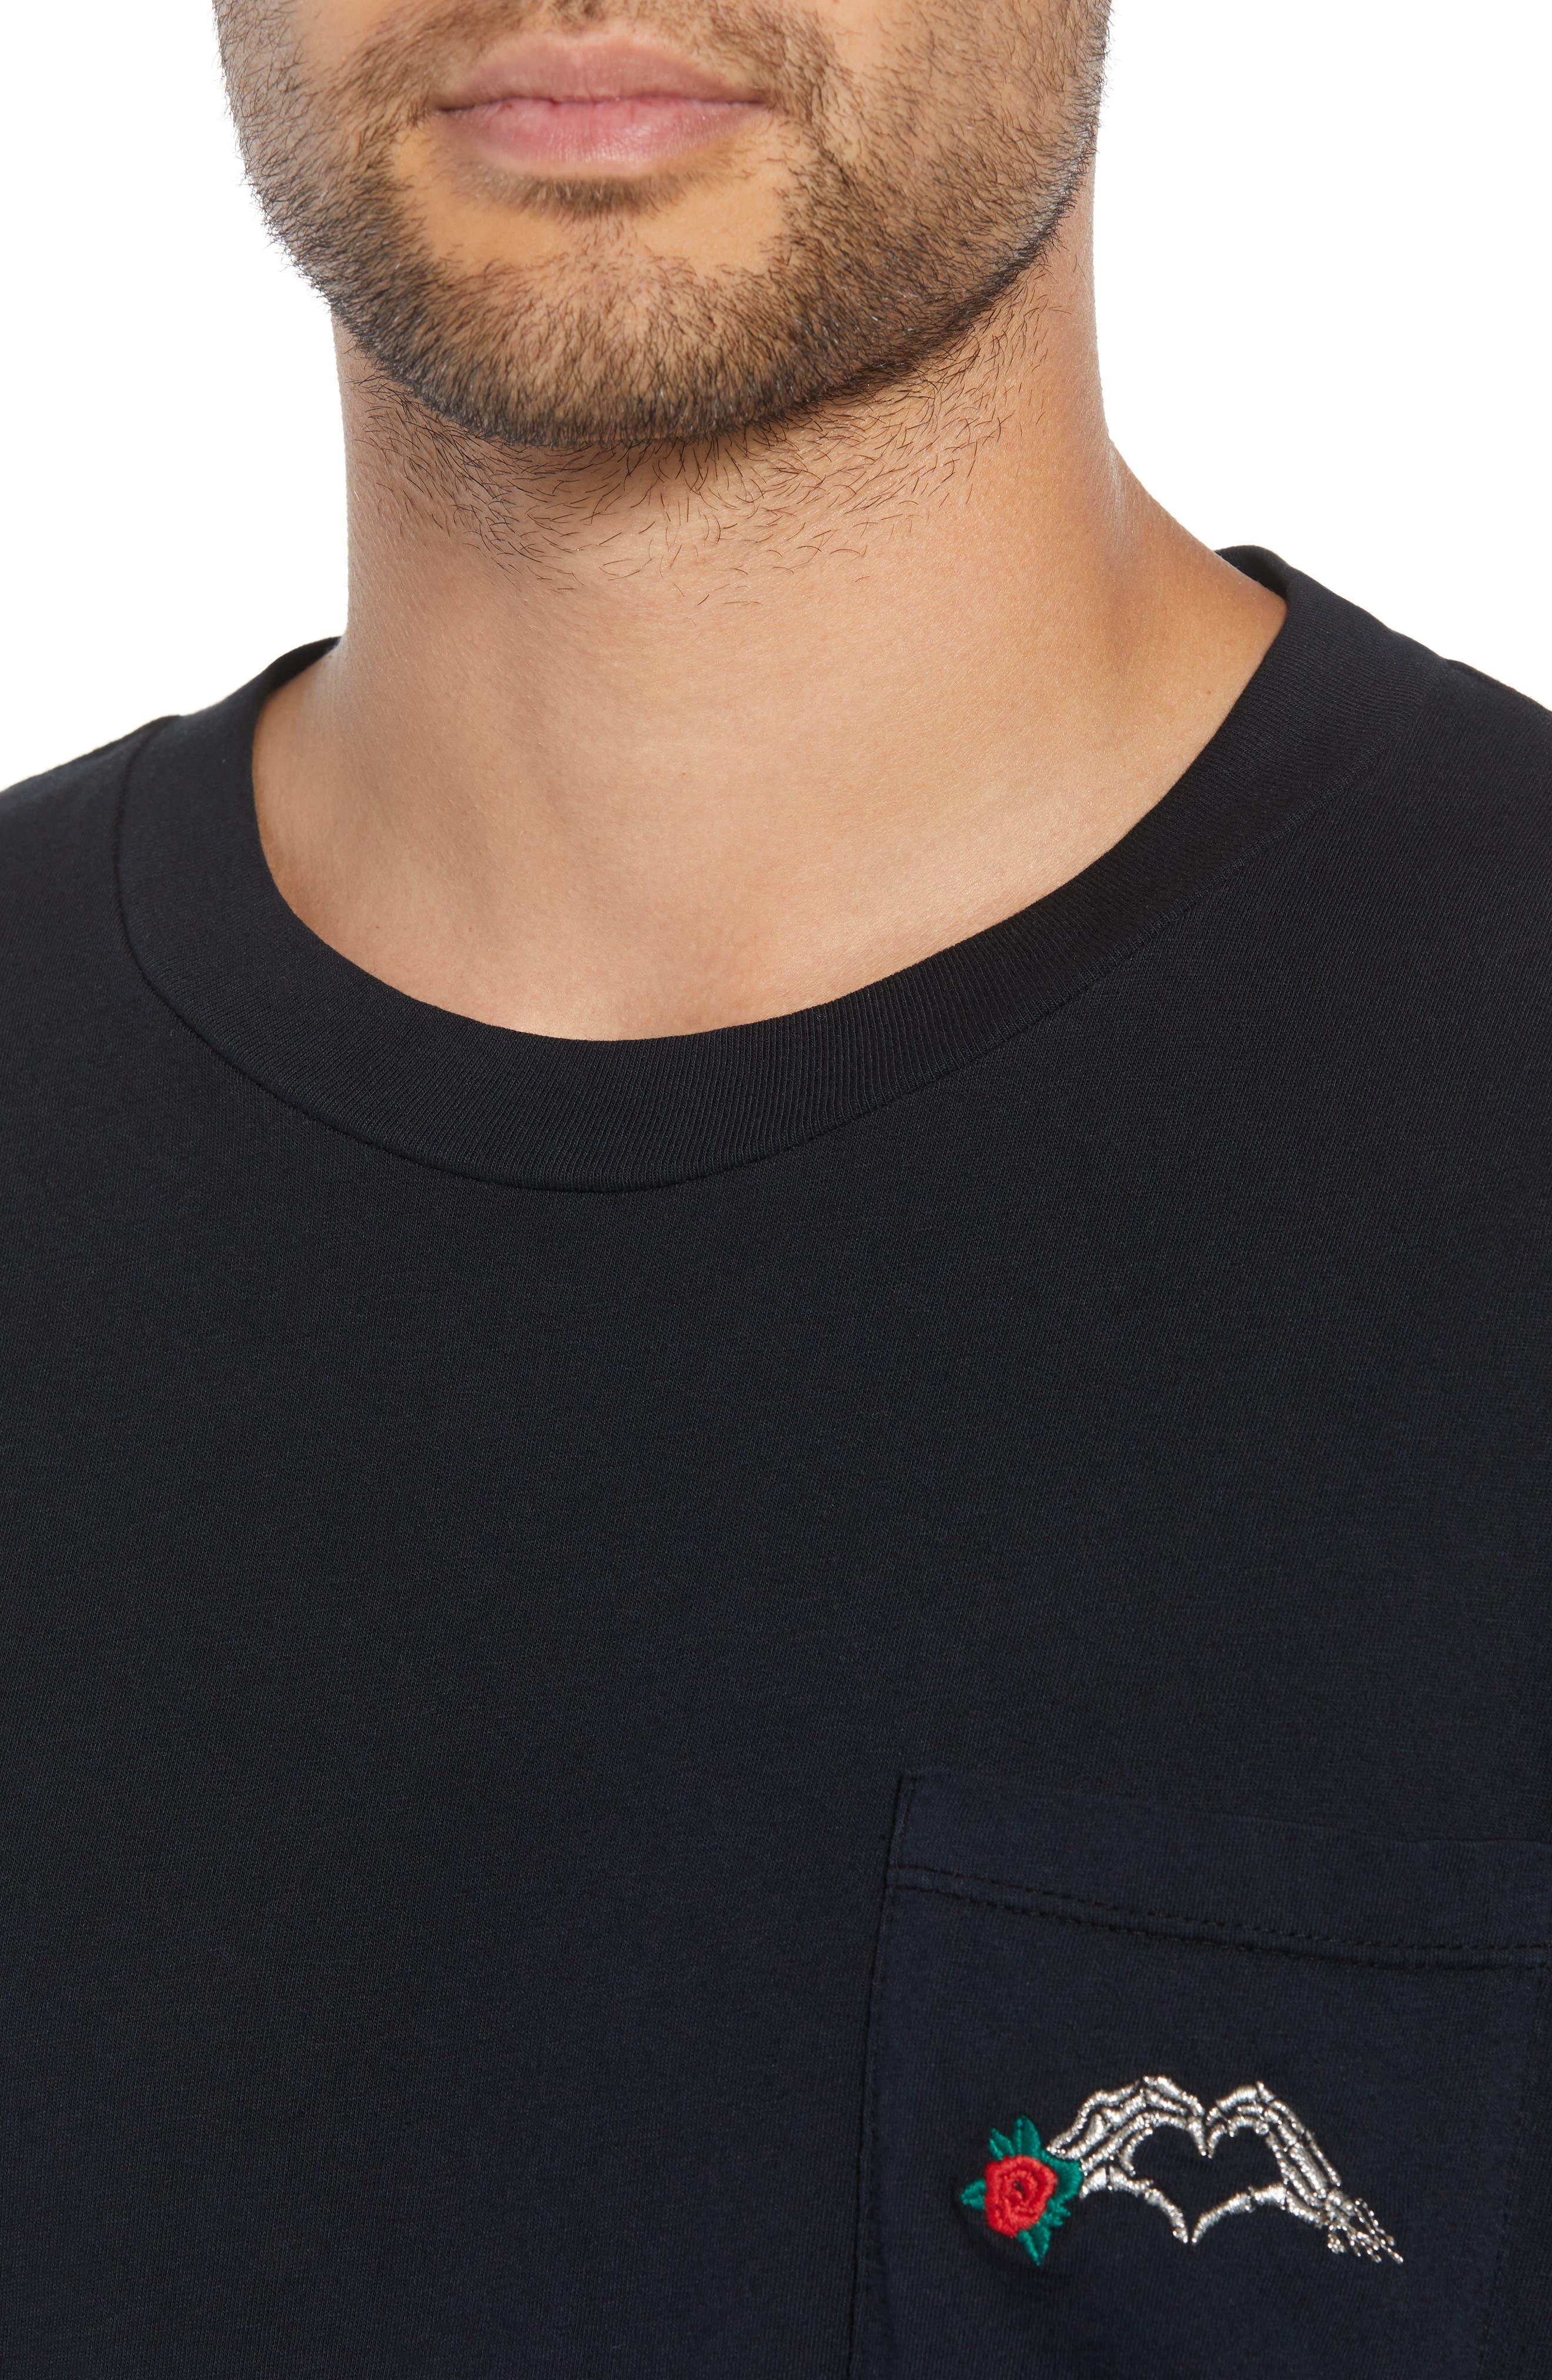 Hayes T-Shirt,                             Alternate thumbnail 4, color,                             BLACK